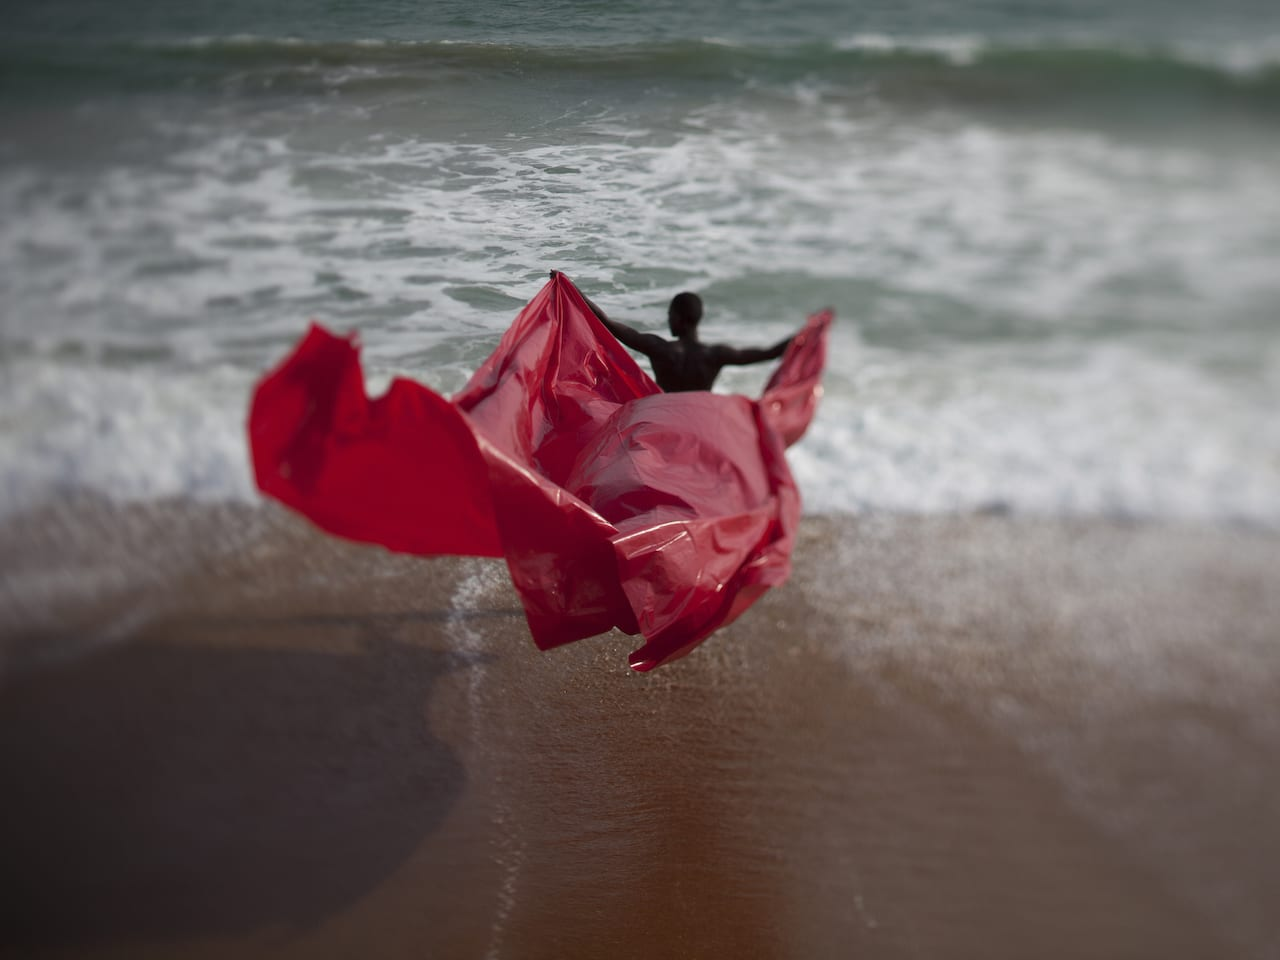 Les rencontres d'arles 2018 photography festival